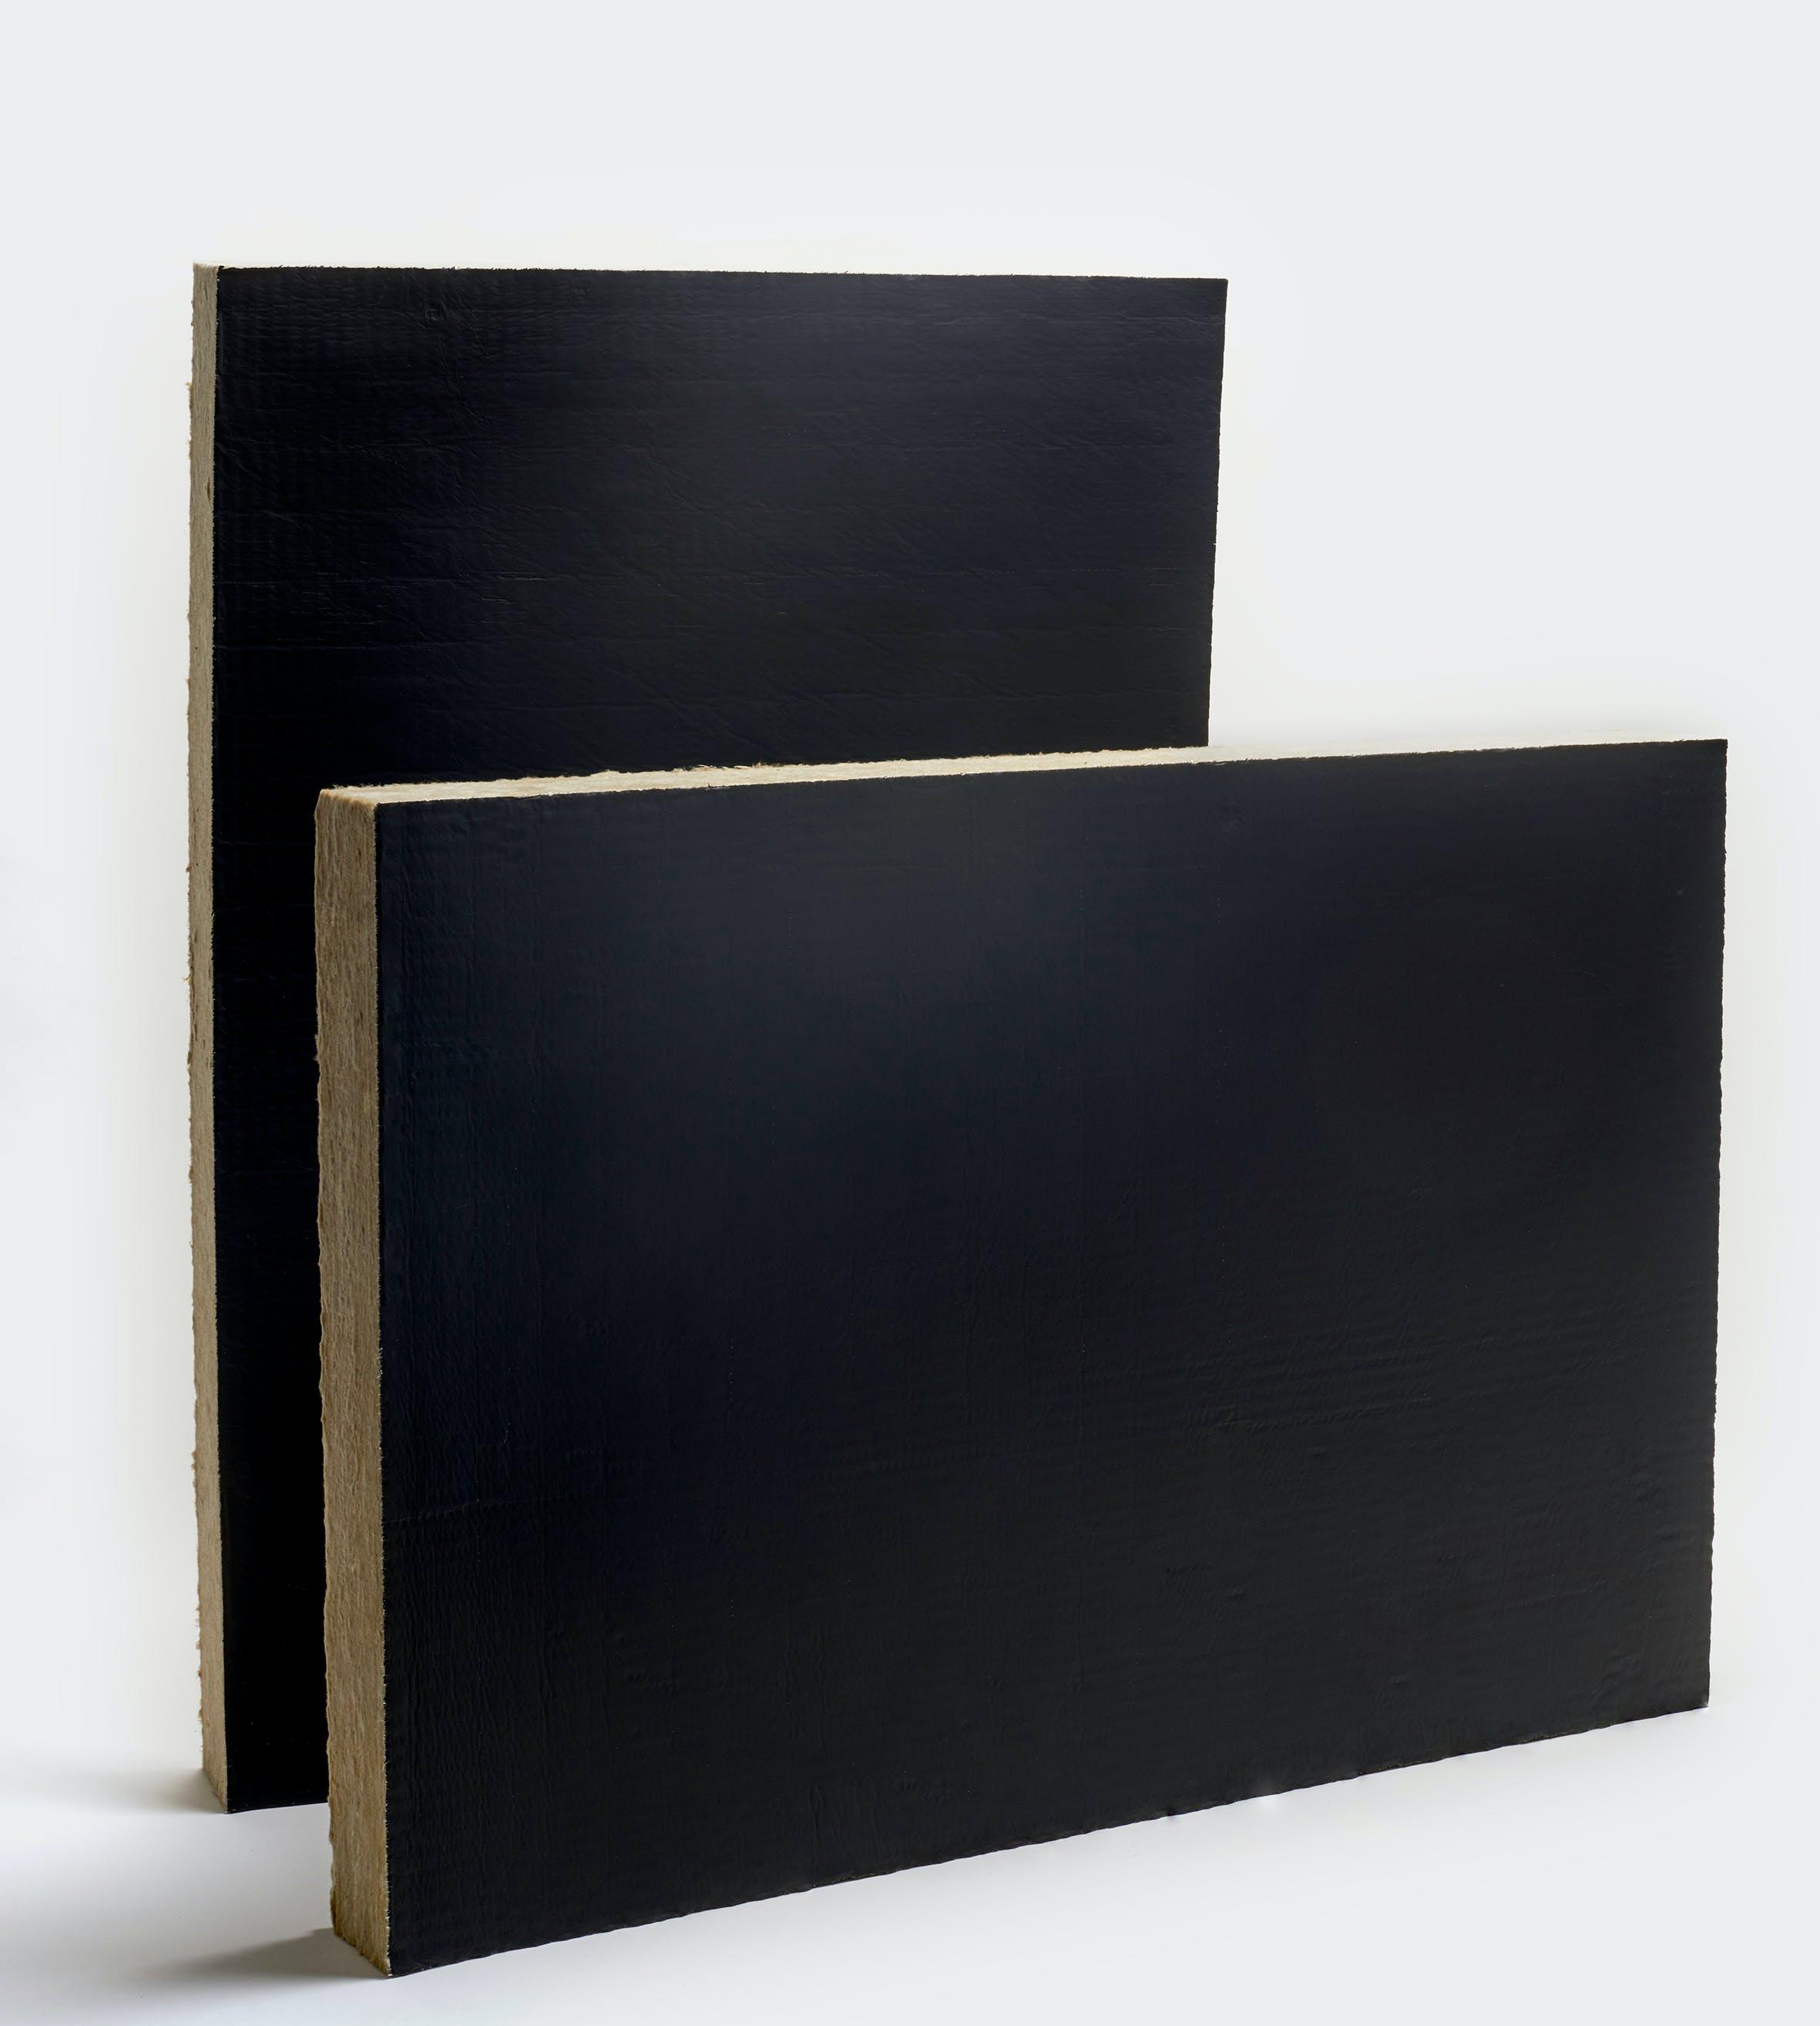 conlit Duct Board 90, HVAC insulation, ventilation duct, fireproof, brandschutz, lüftungskanäle, stahlblech, germany,